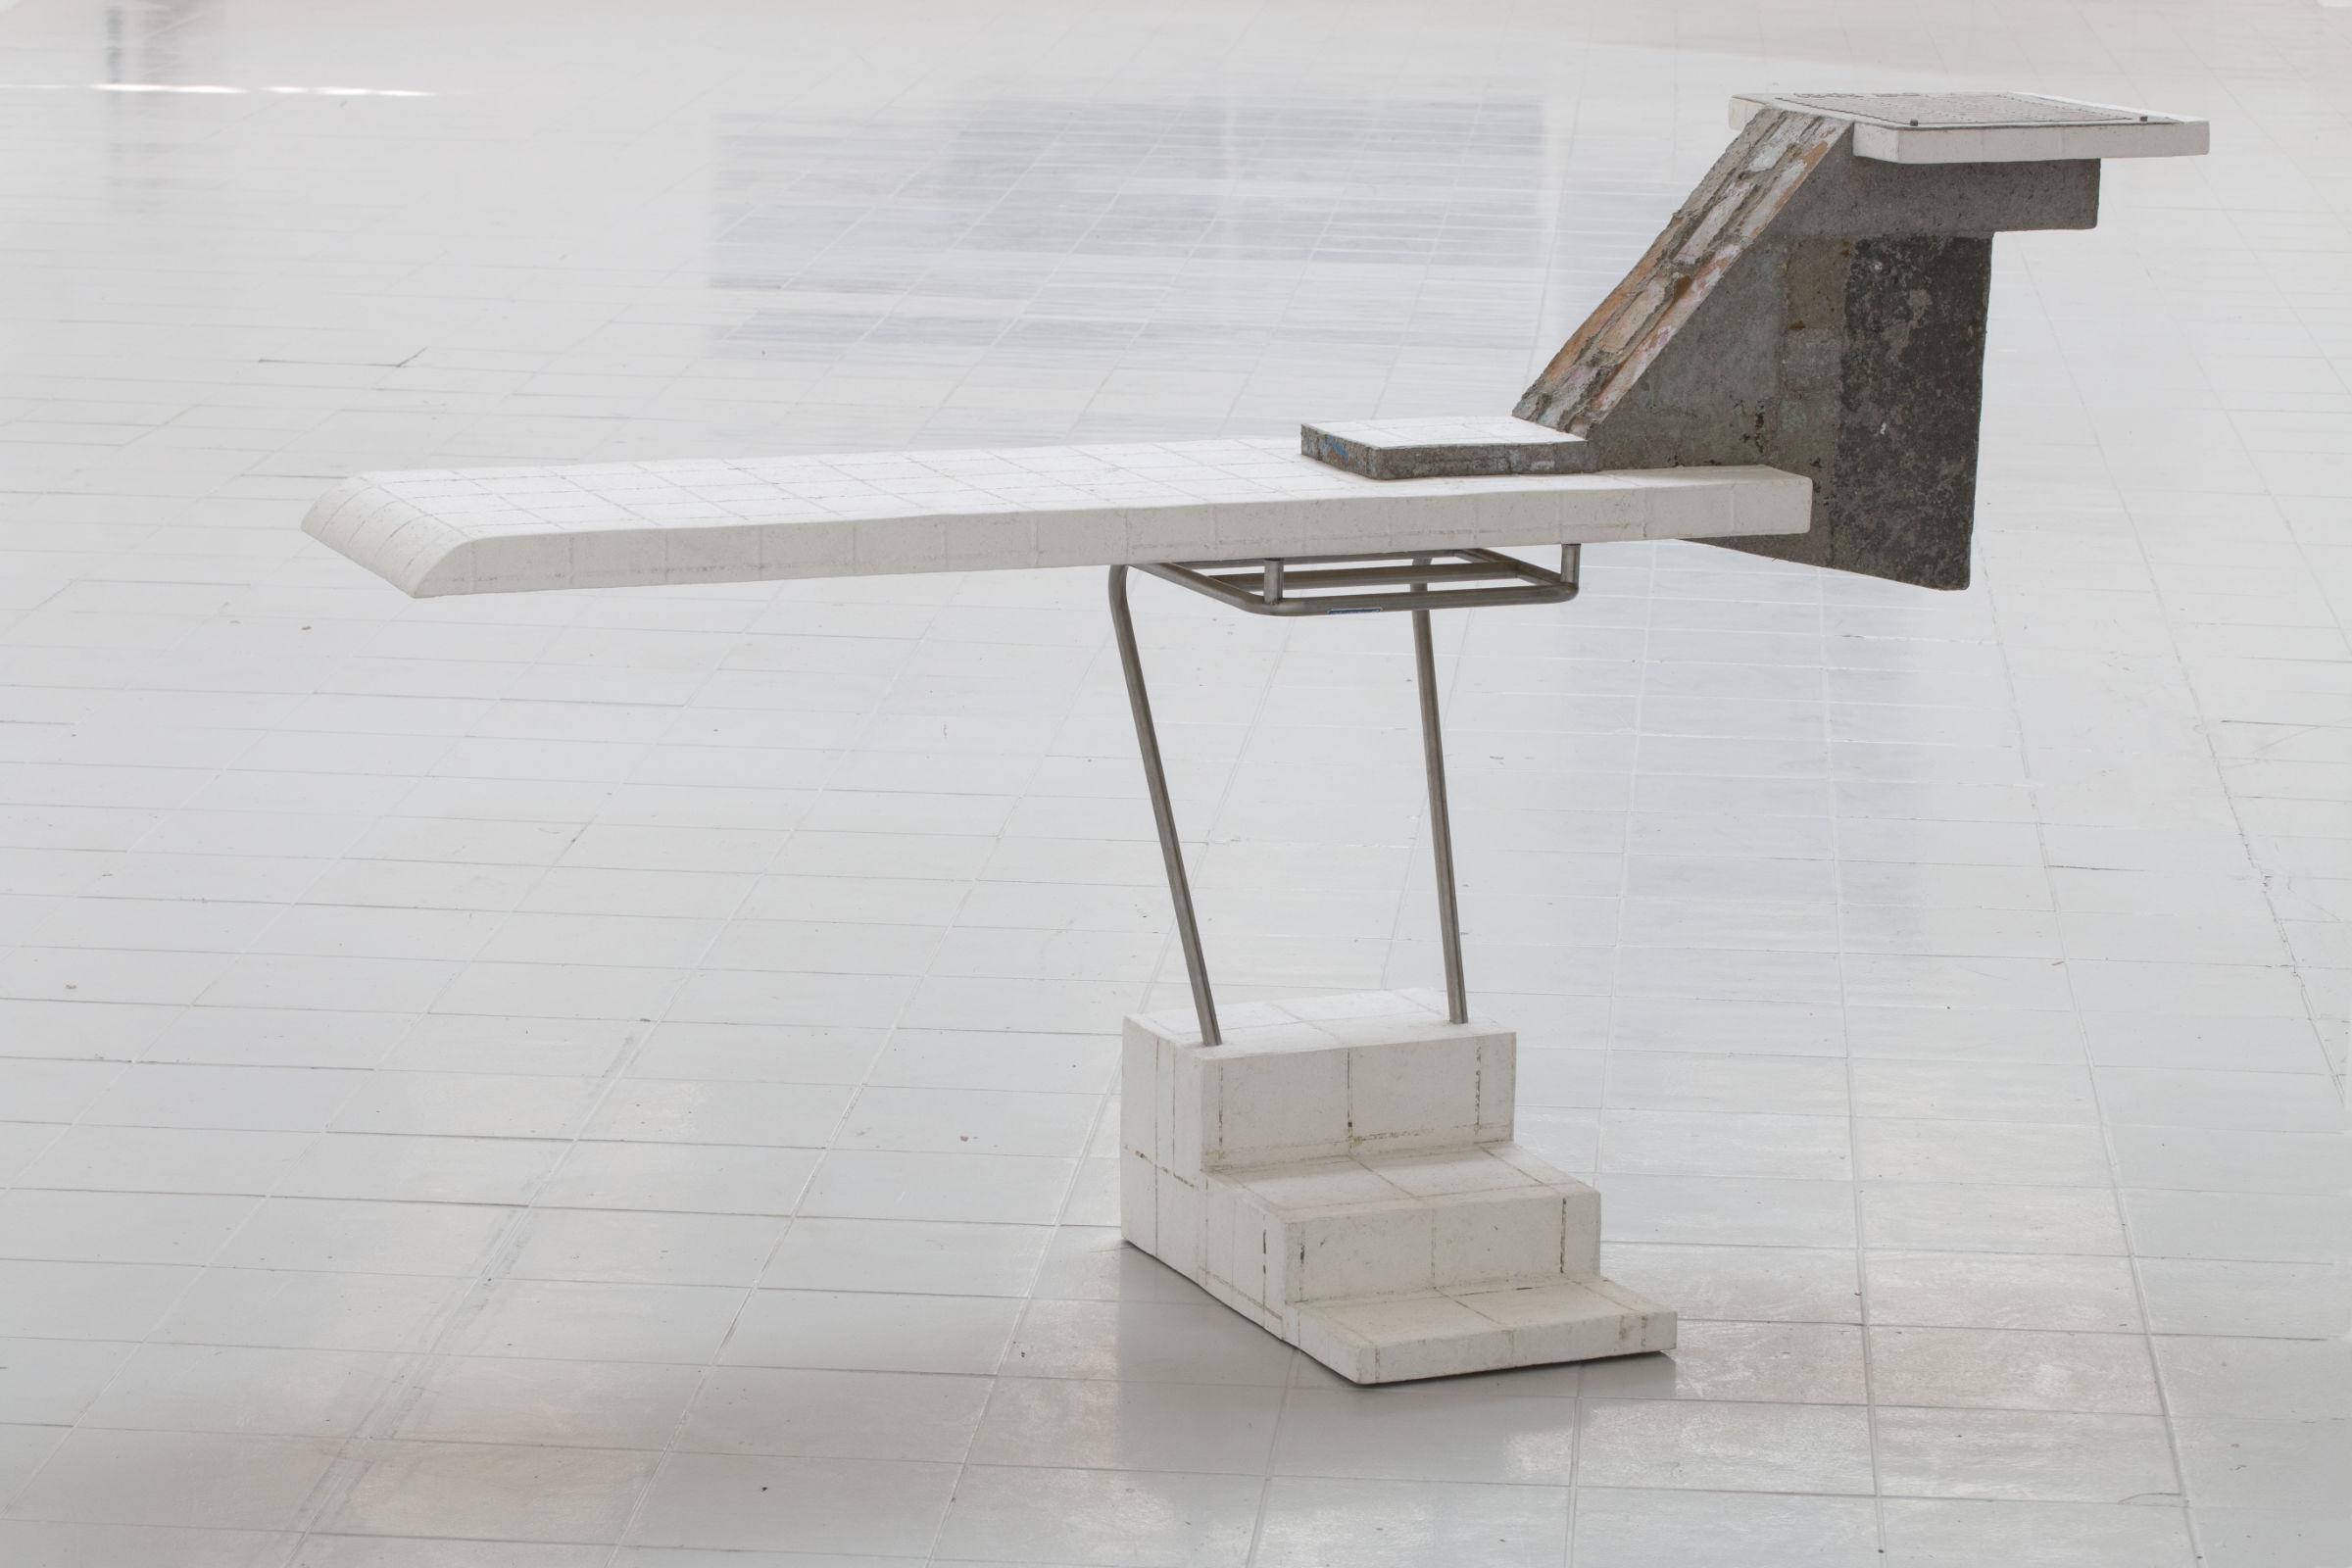 1_free-jump-_-2019-_-Papermachewallimprints-steel-210cm-160cm-50cm_MG_0147